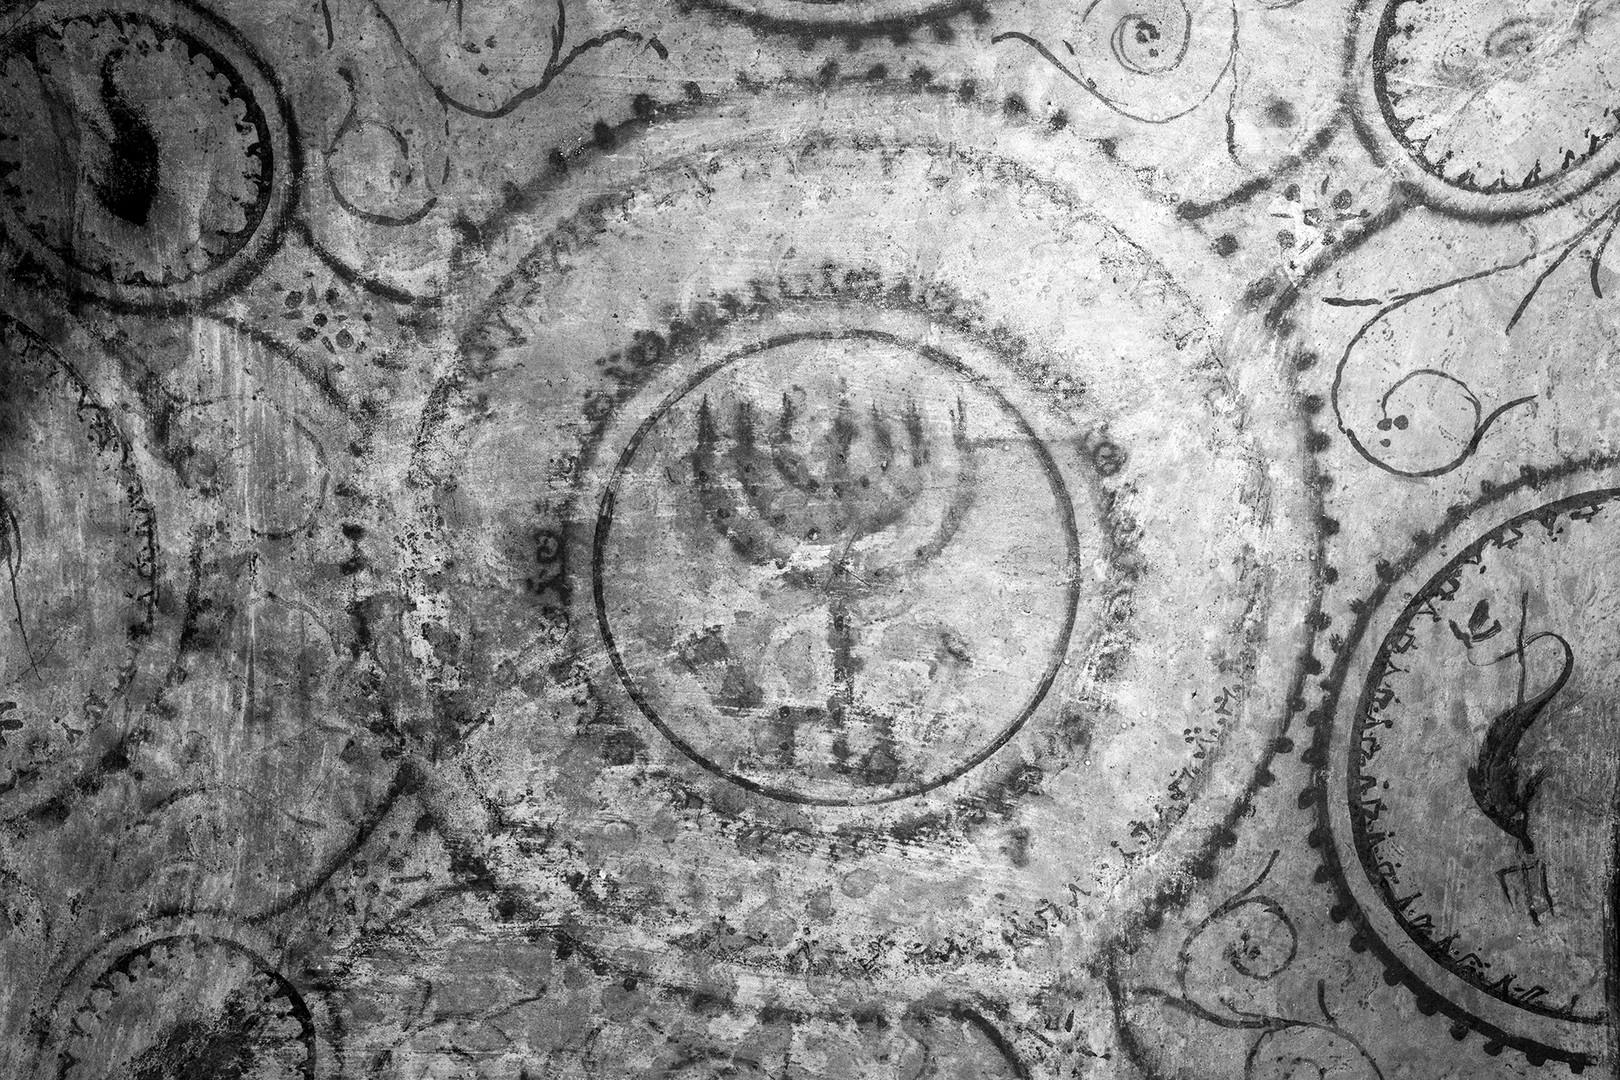 Property of Antiquities Authority - ©Yuval Baruch Ph. Jacopo Brogioni